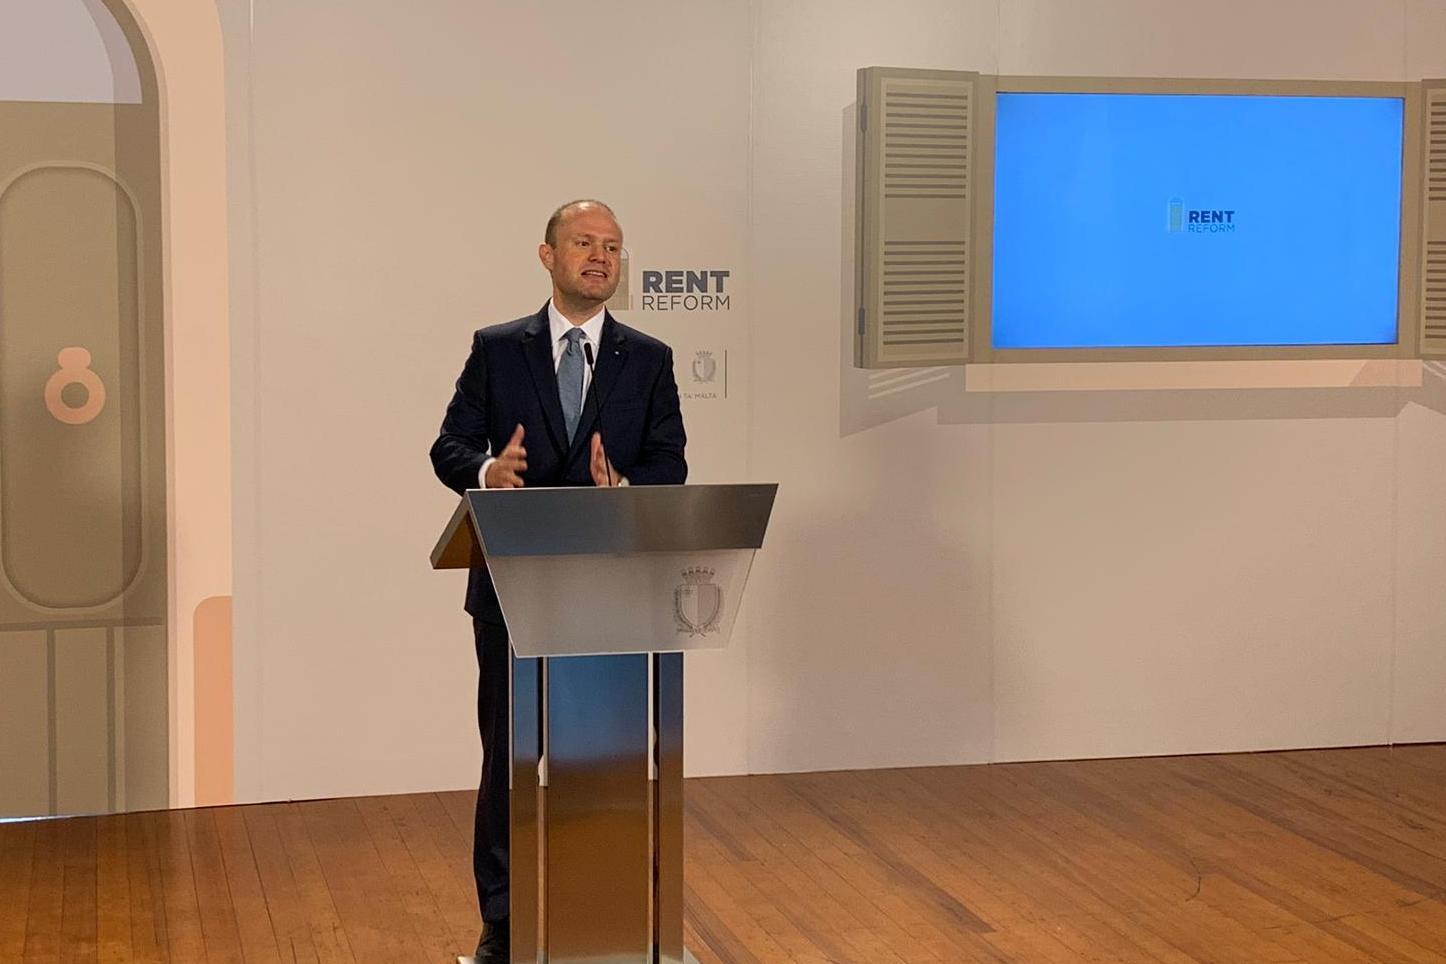 Joseph Muscat addressing Wednesday's press conference. Photo: Ivan Martin